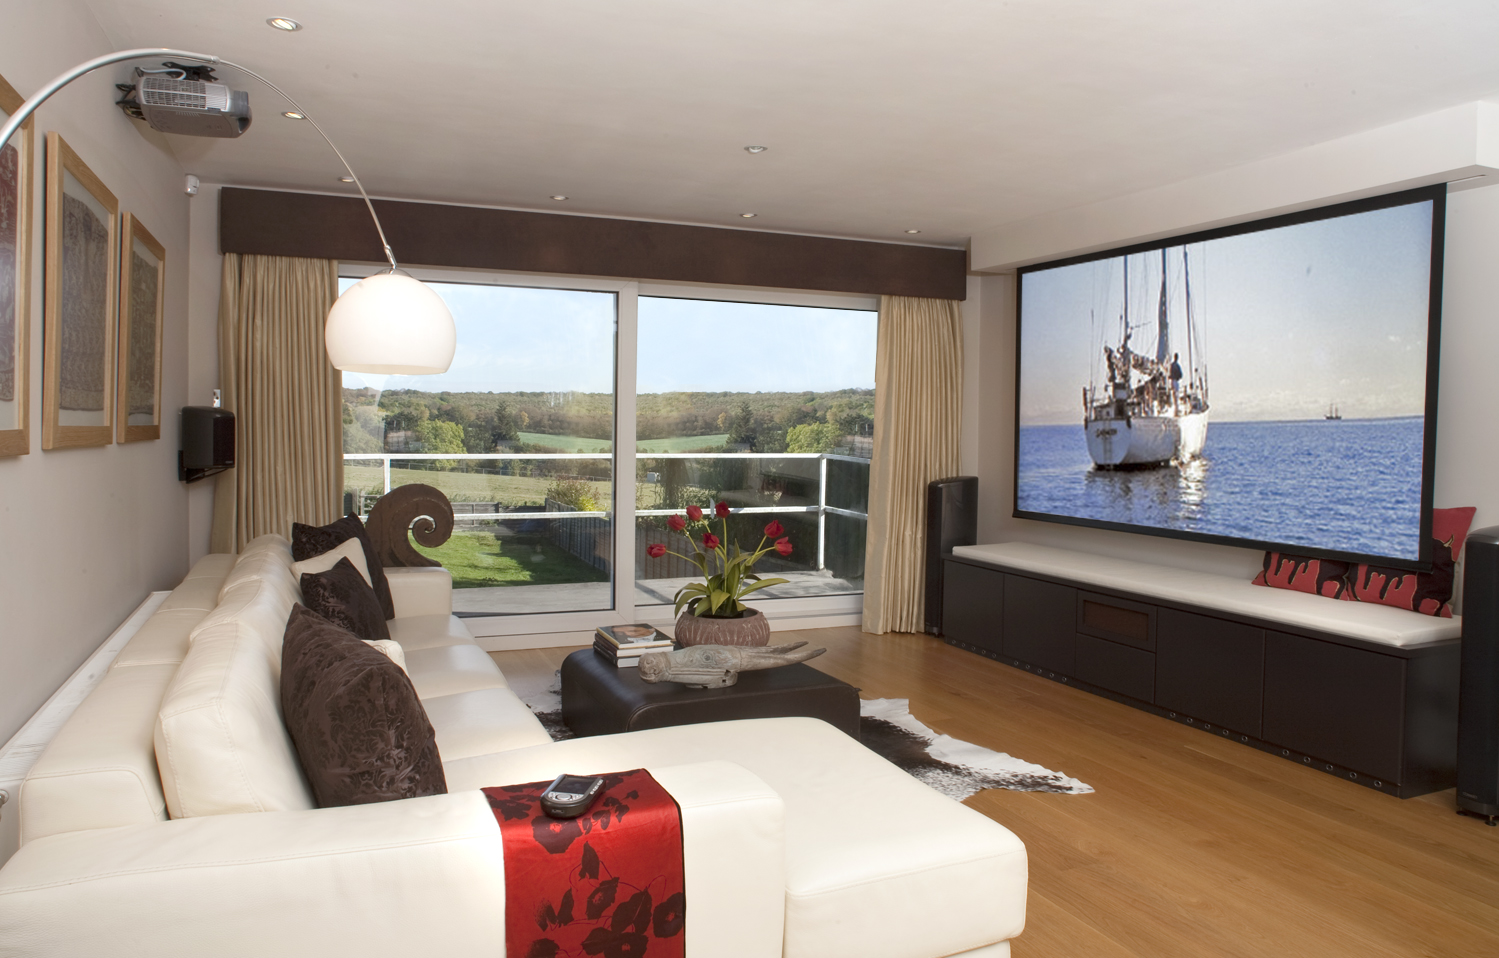 Best Home Cctv >> The Art of Home Cinema Integration - Inspiring Designs